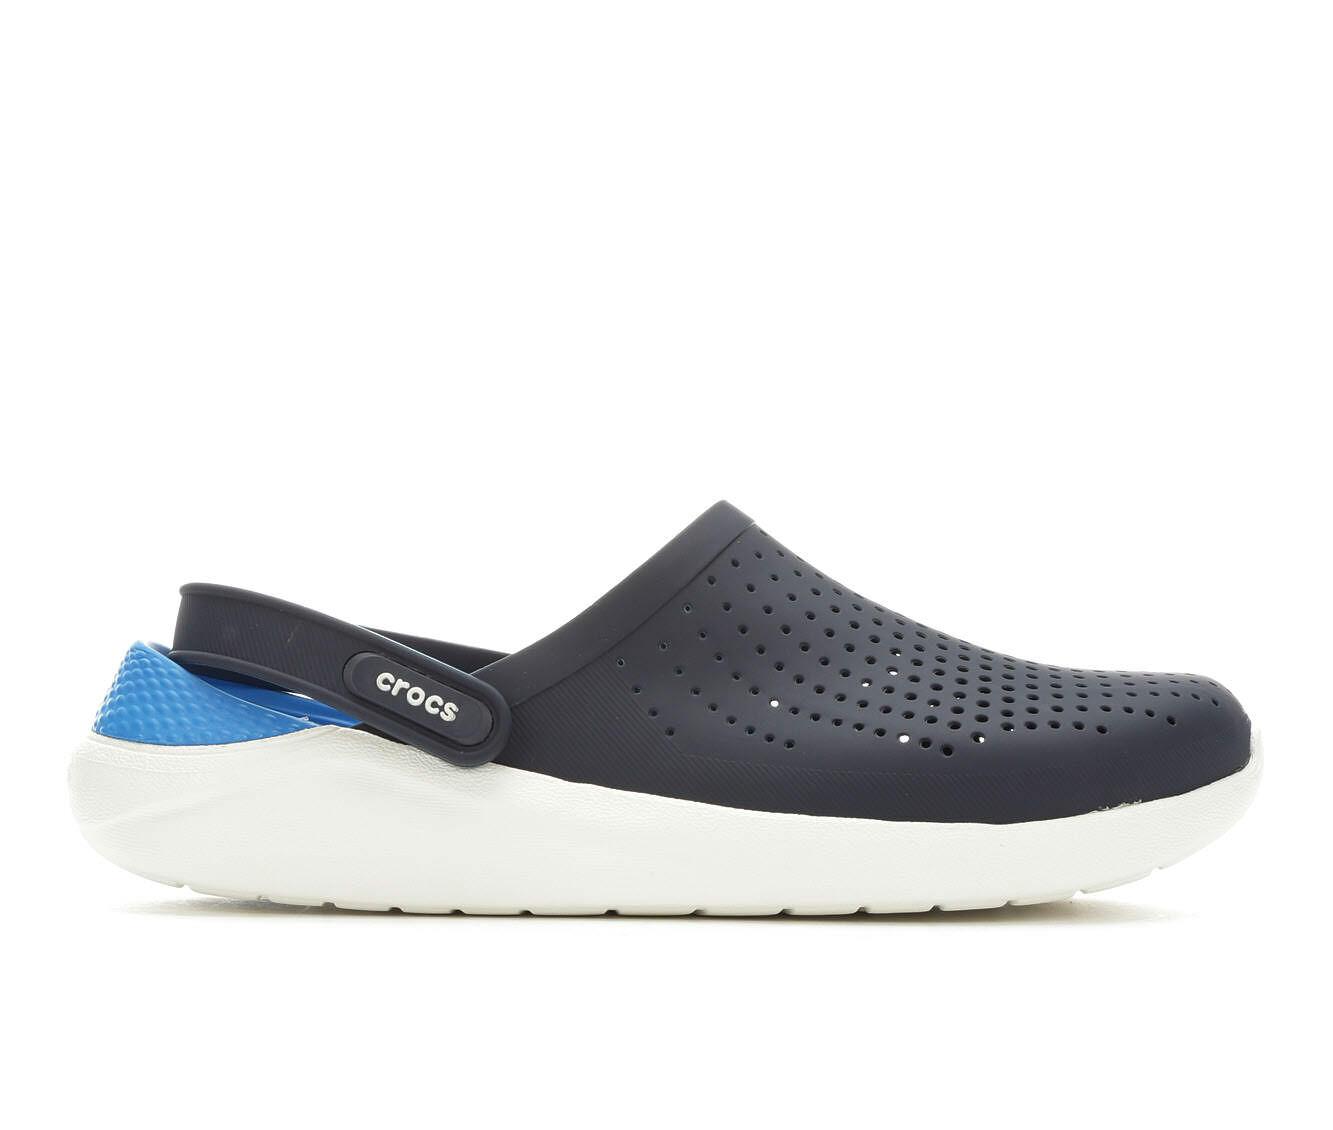 Men's Crocs LiteRide Clog Navy/White